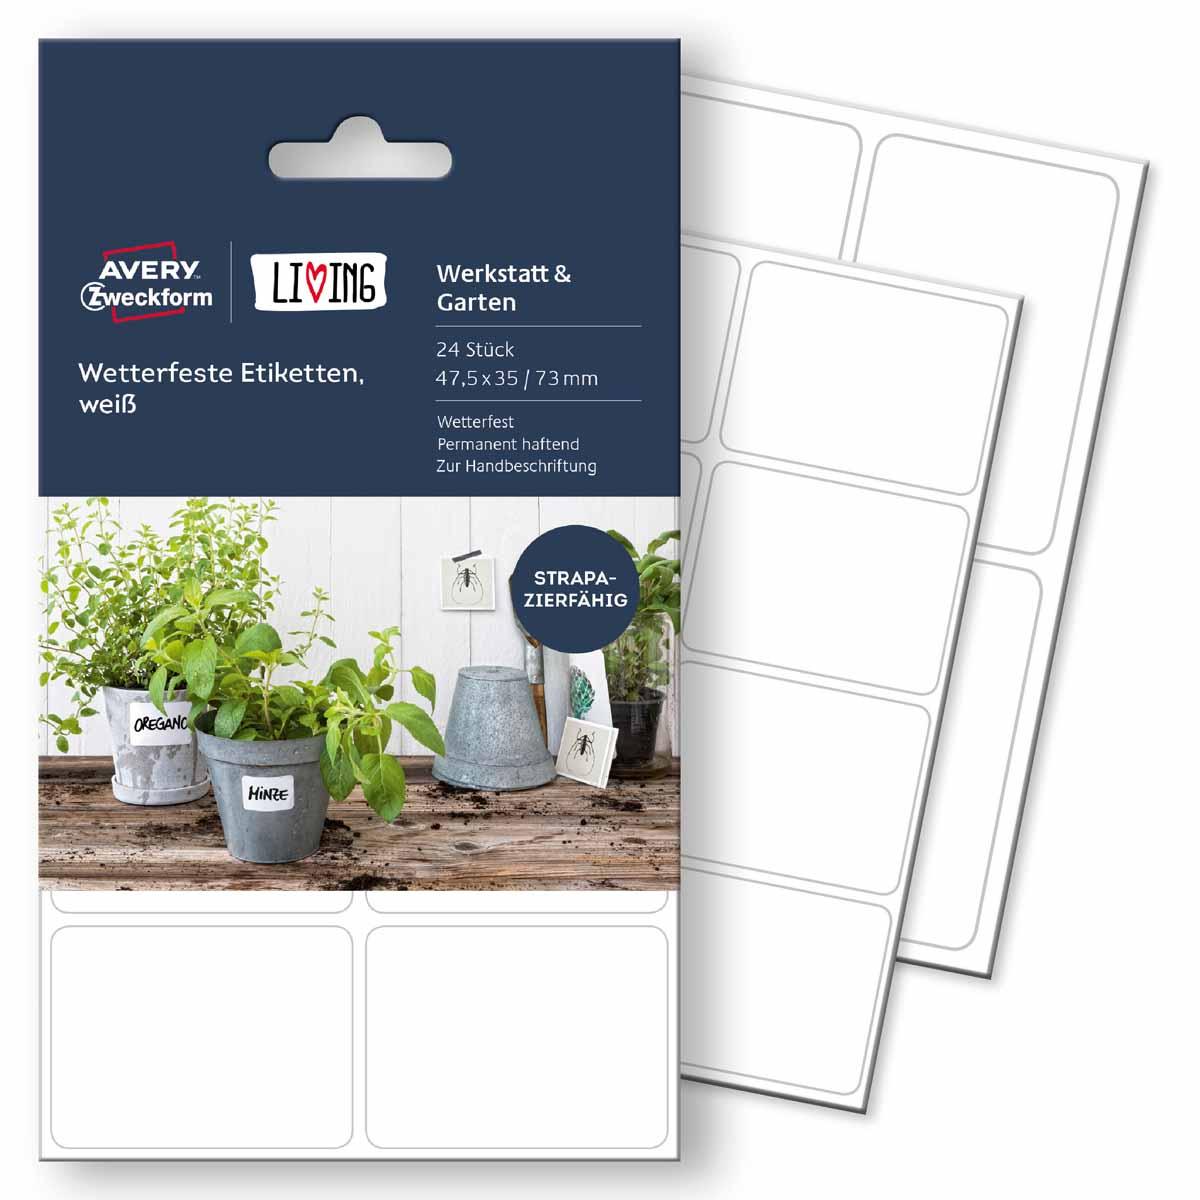 Avery Zweckform Этикетки для дома Living 47,5 х 35 мм цвет белый